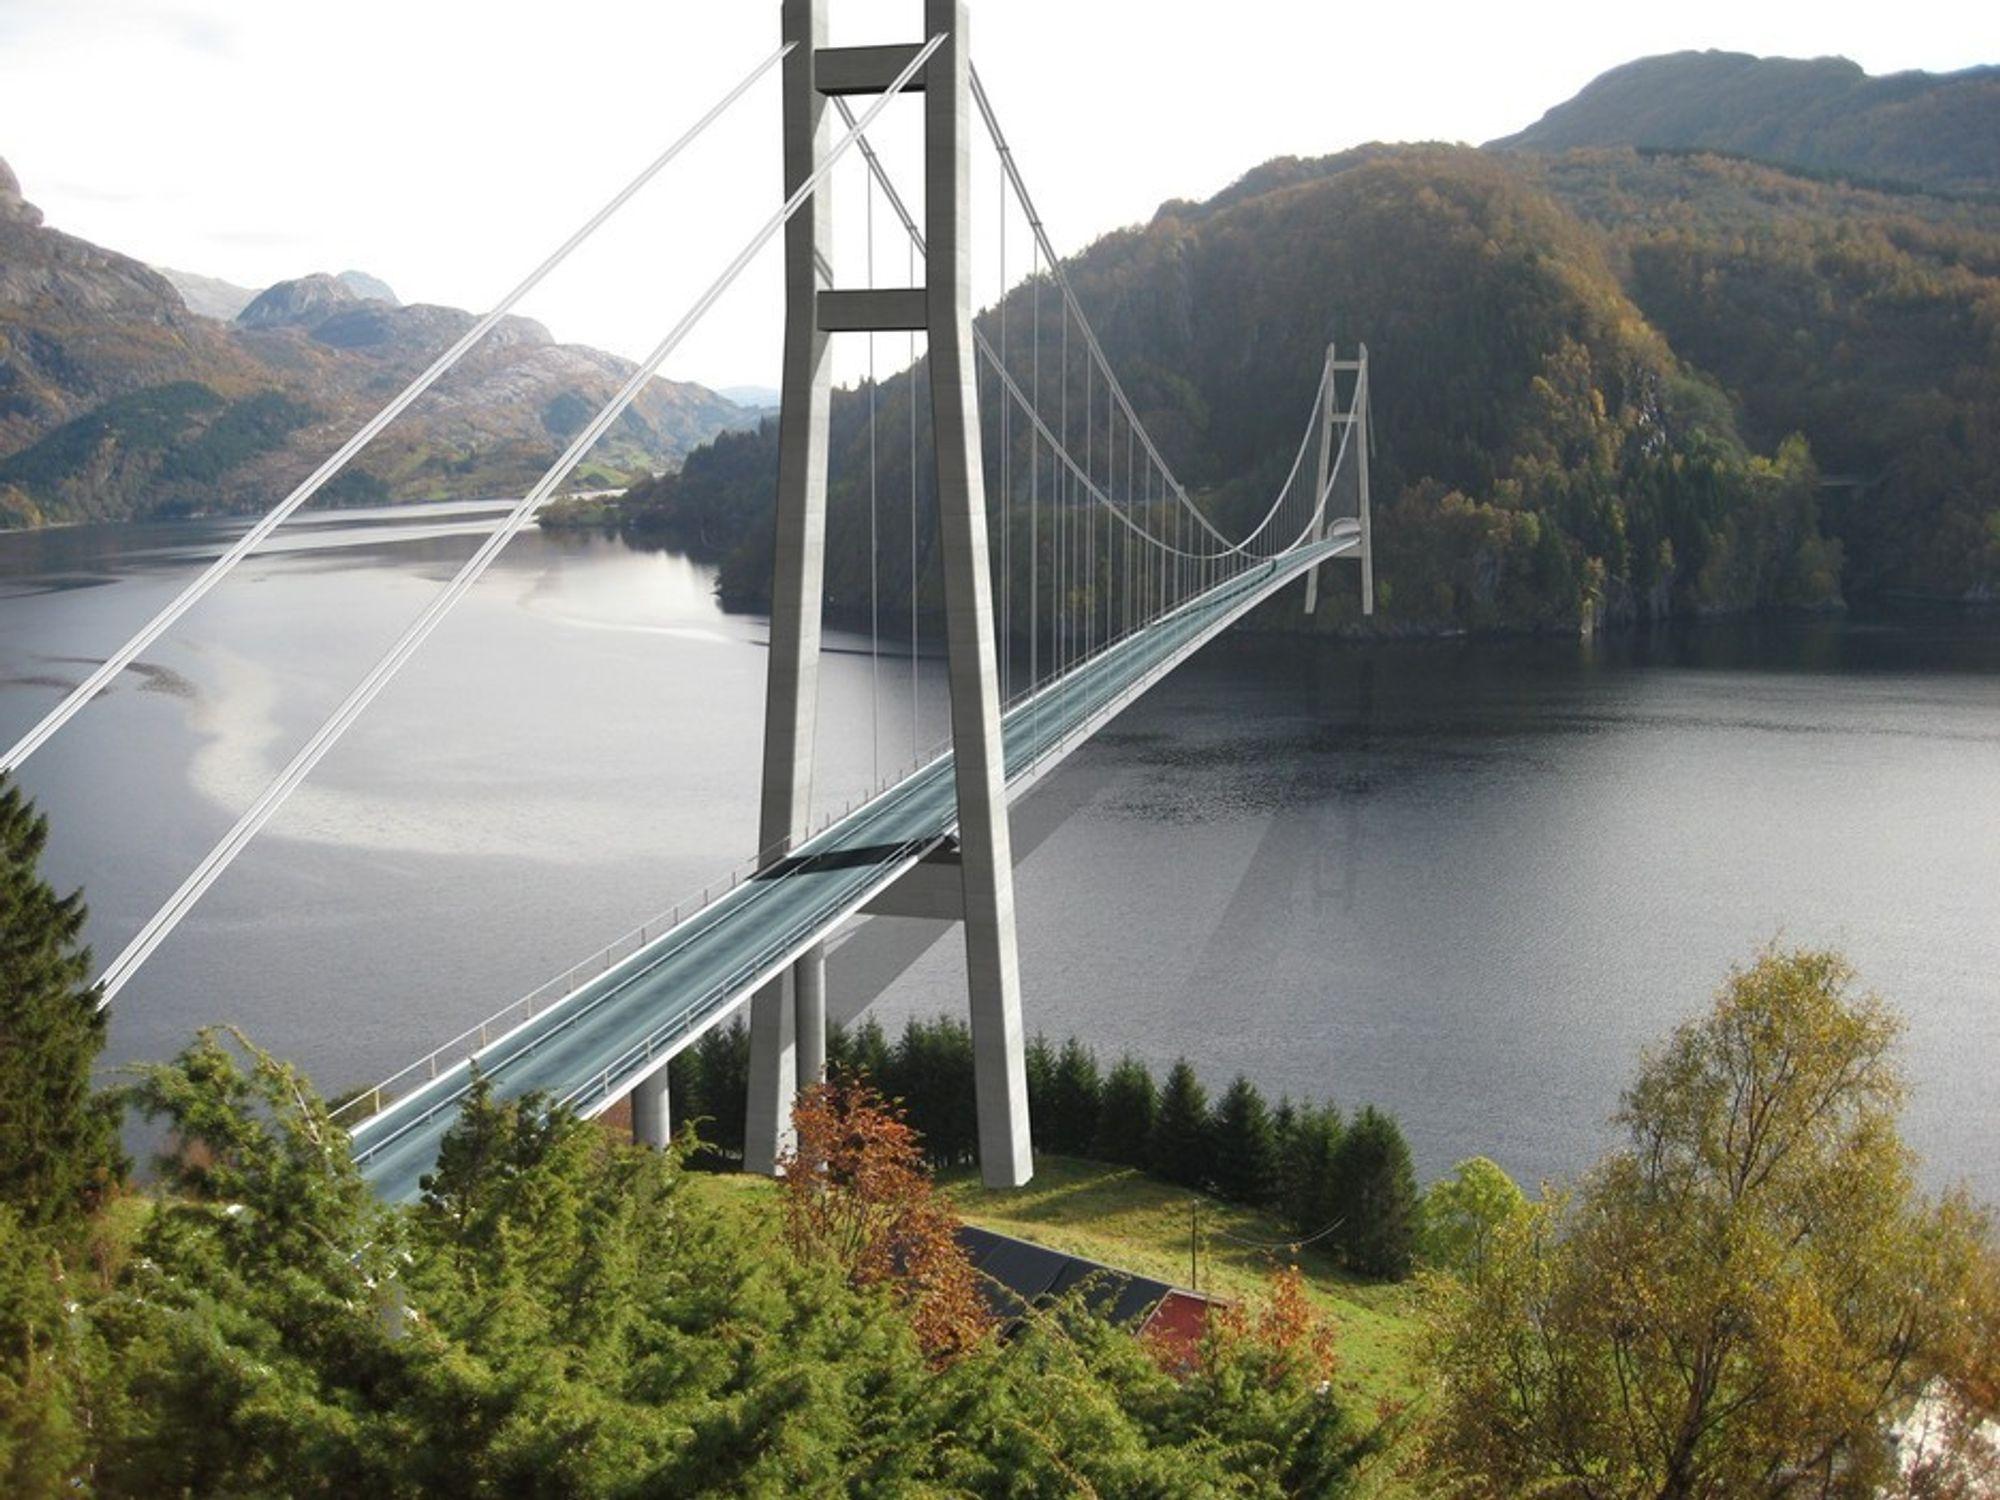 Jevn kamp om elektro på Dalsfjordsambandet